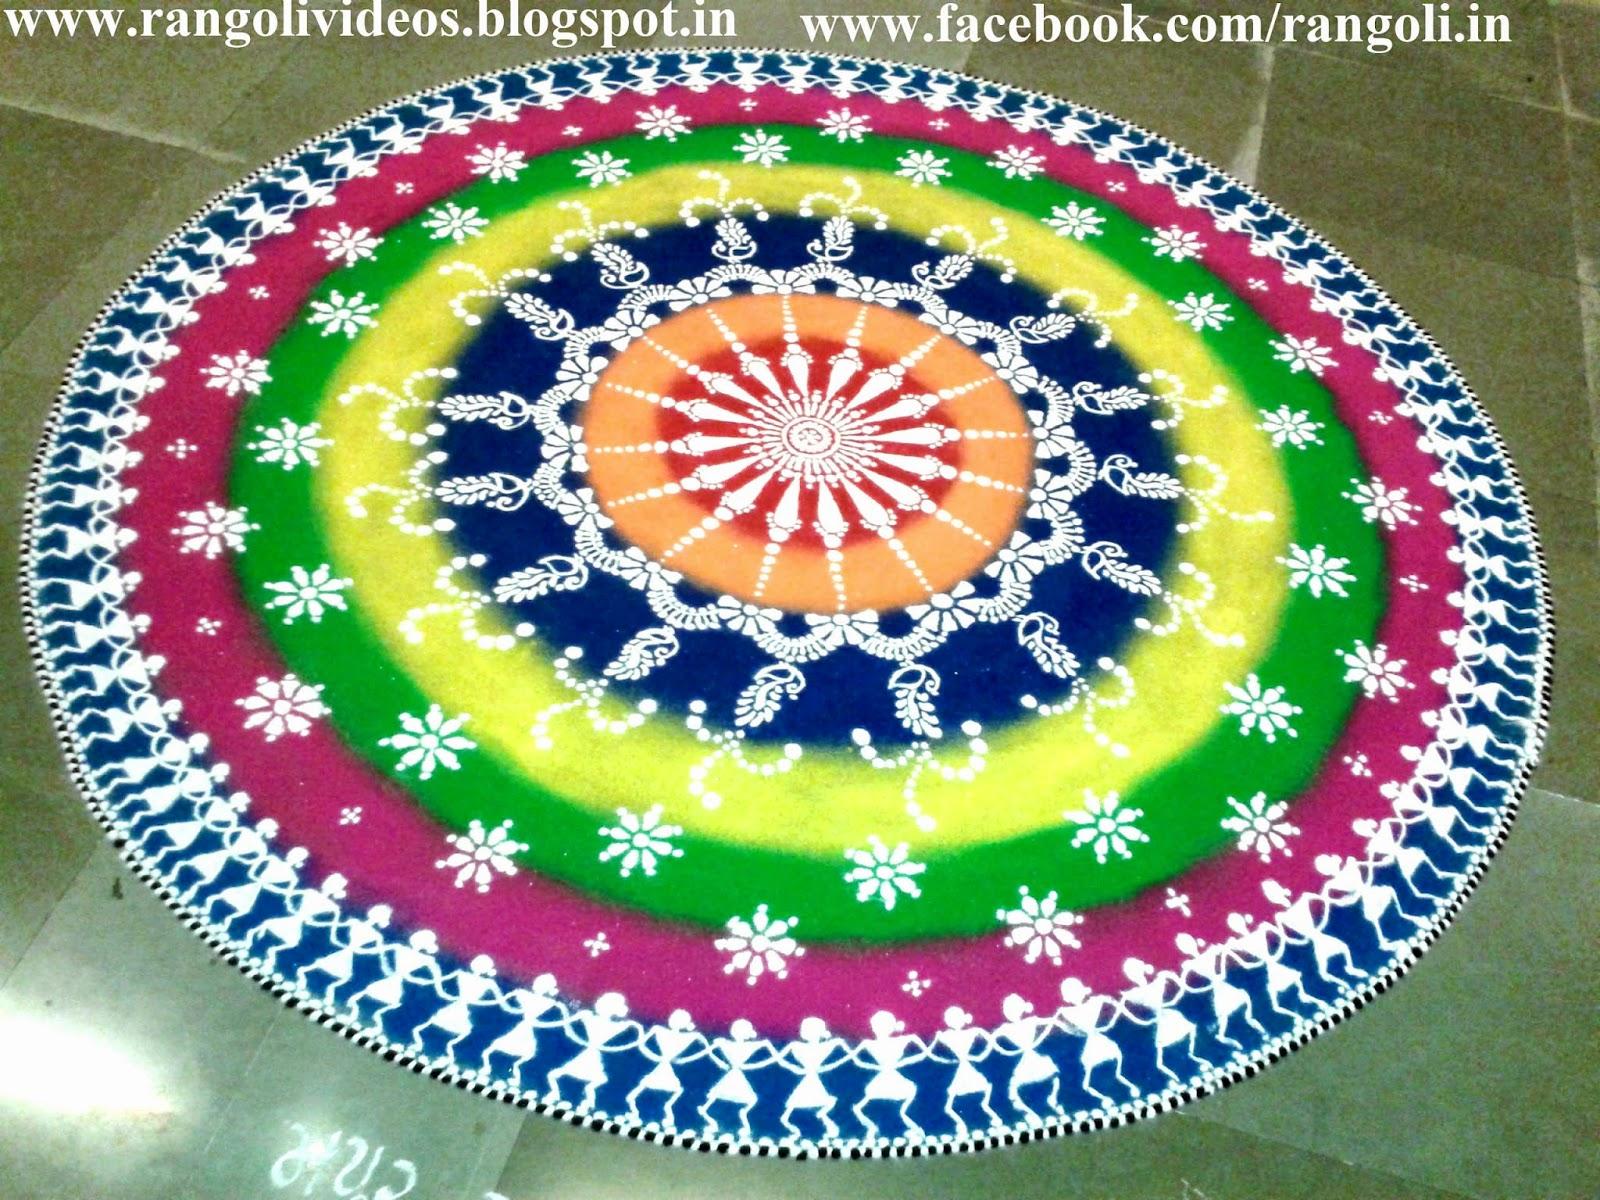 Diwali Rangoli , Kolam , Designs Images: November 2013  Diwali Rangoli Images Designs Diwali Rangoli